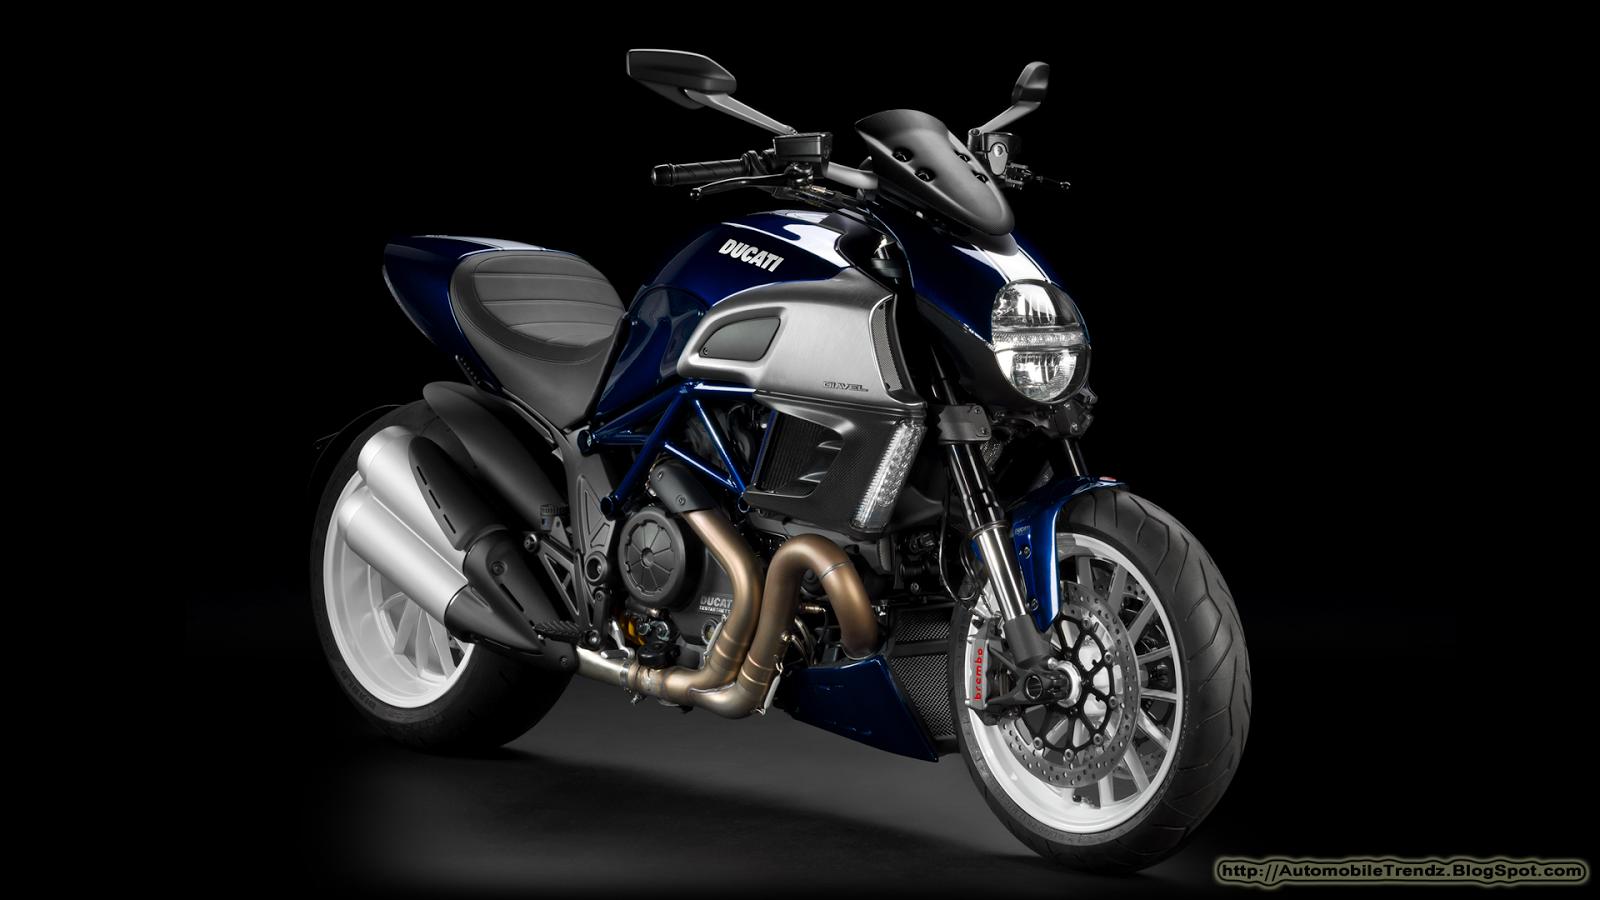 Automobile Trendz Ducati Diavel 2013 Wallpapers 1600x900